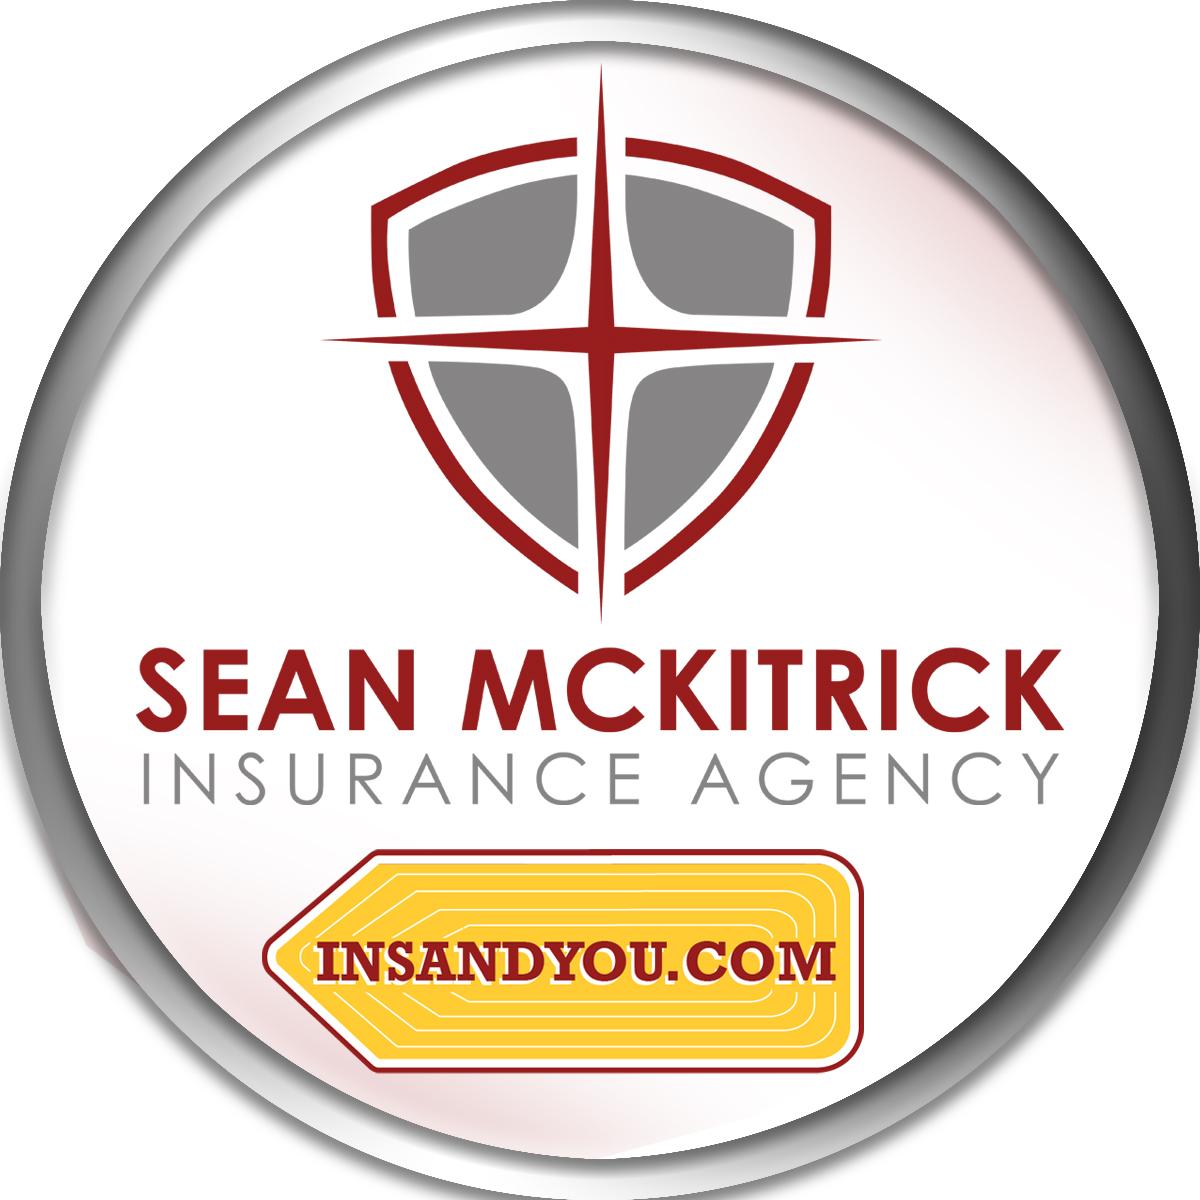 Sean McKitrick Insurance Agency